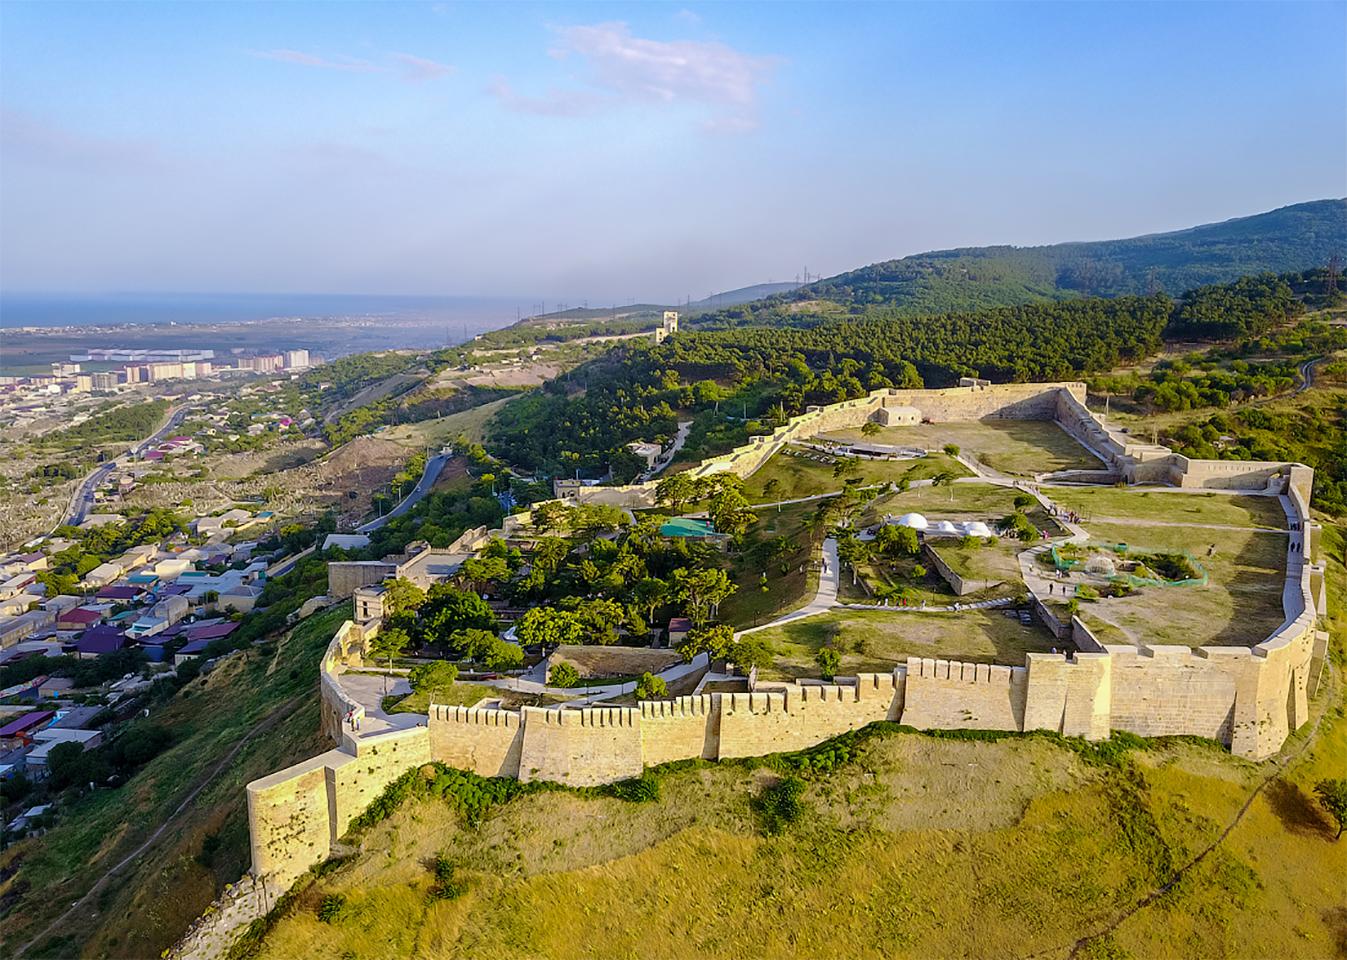 https://trip-kavkaz.com/images/hotel/dagestan/naryn-kala/dagestan-19.jpg